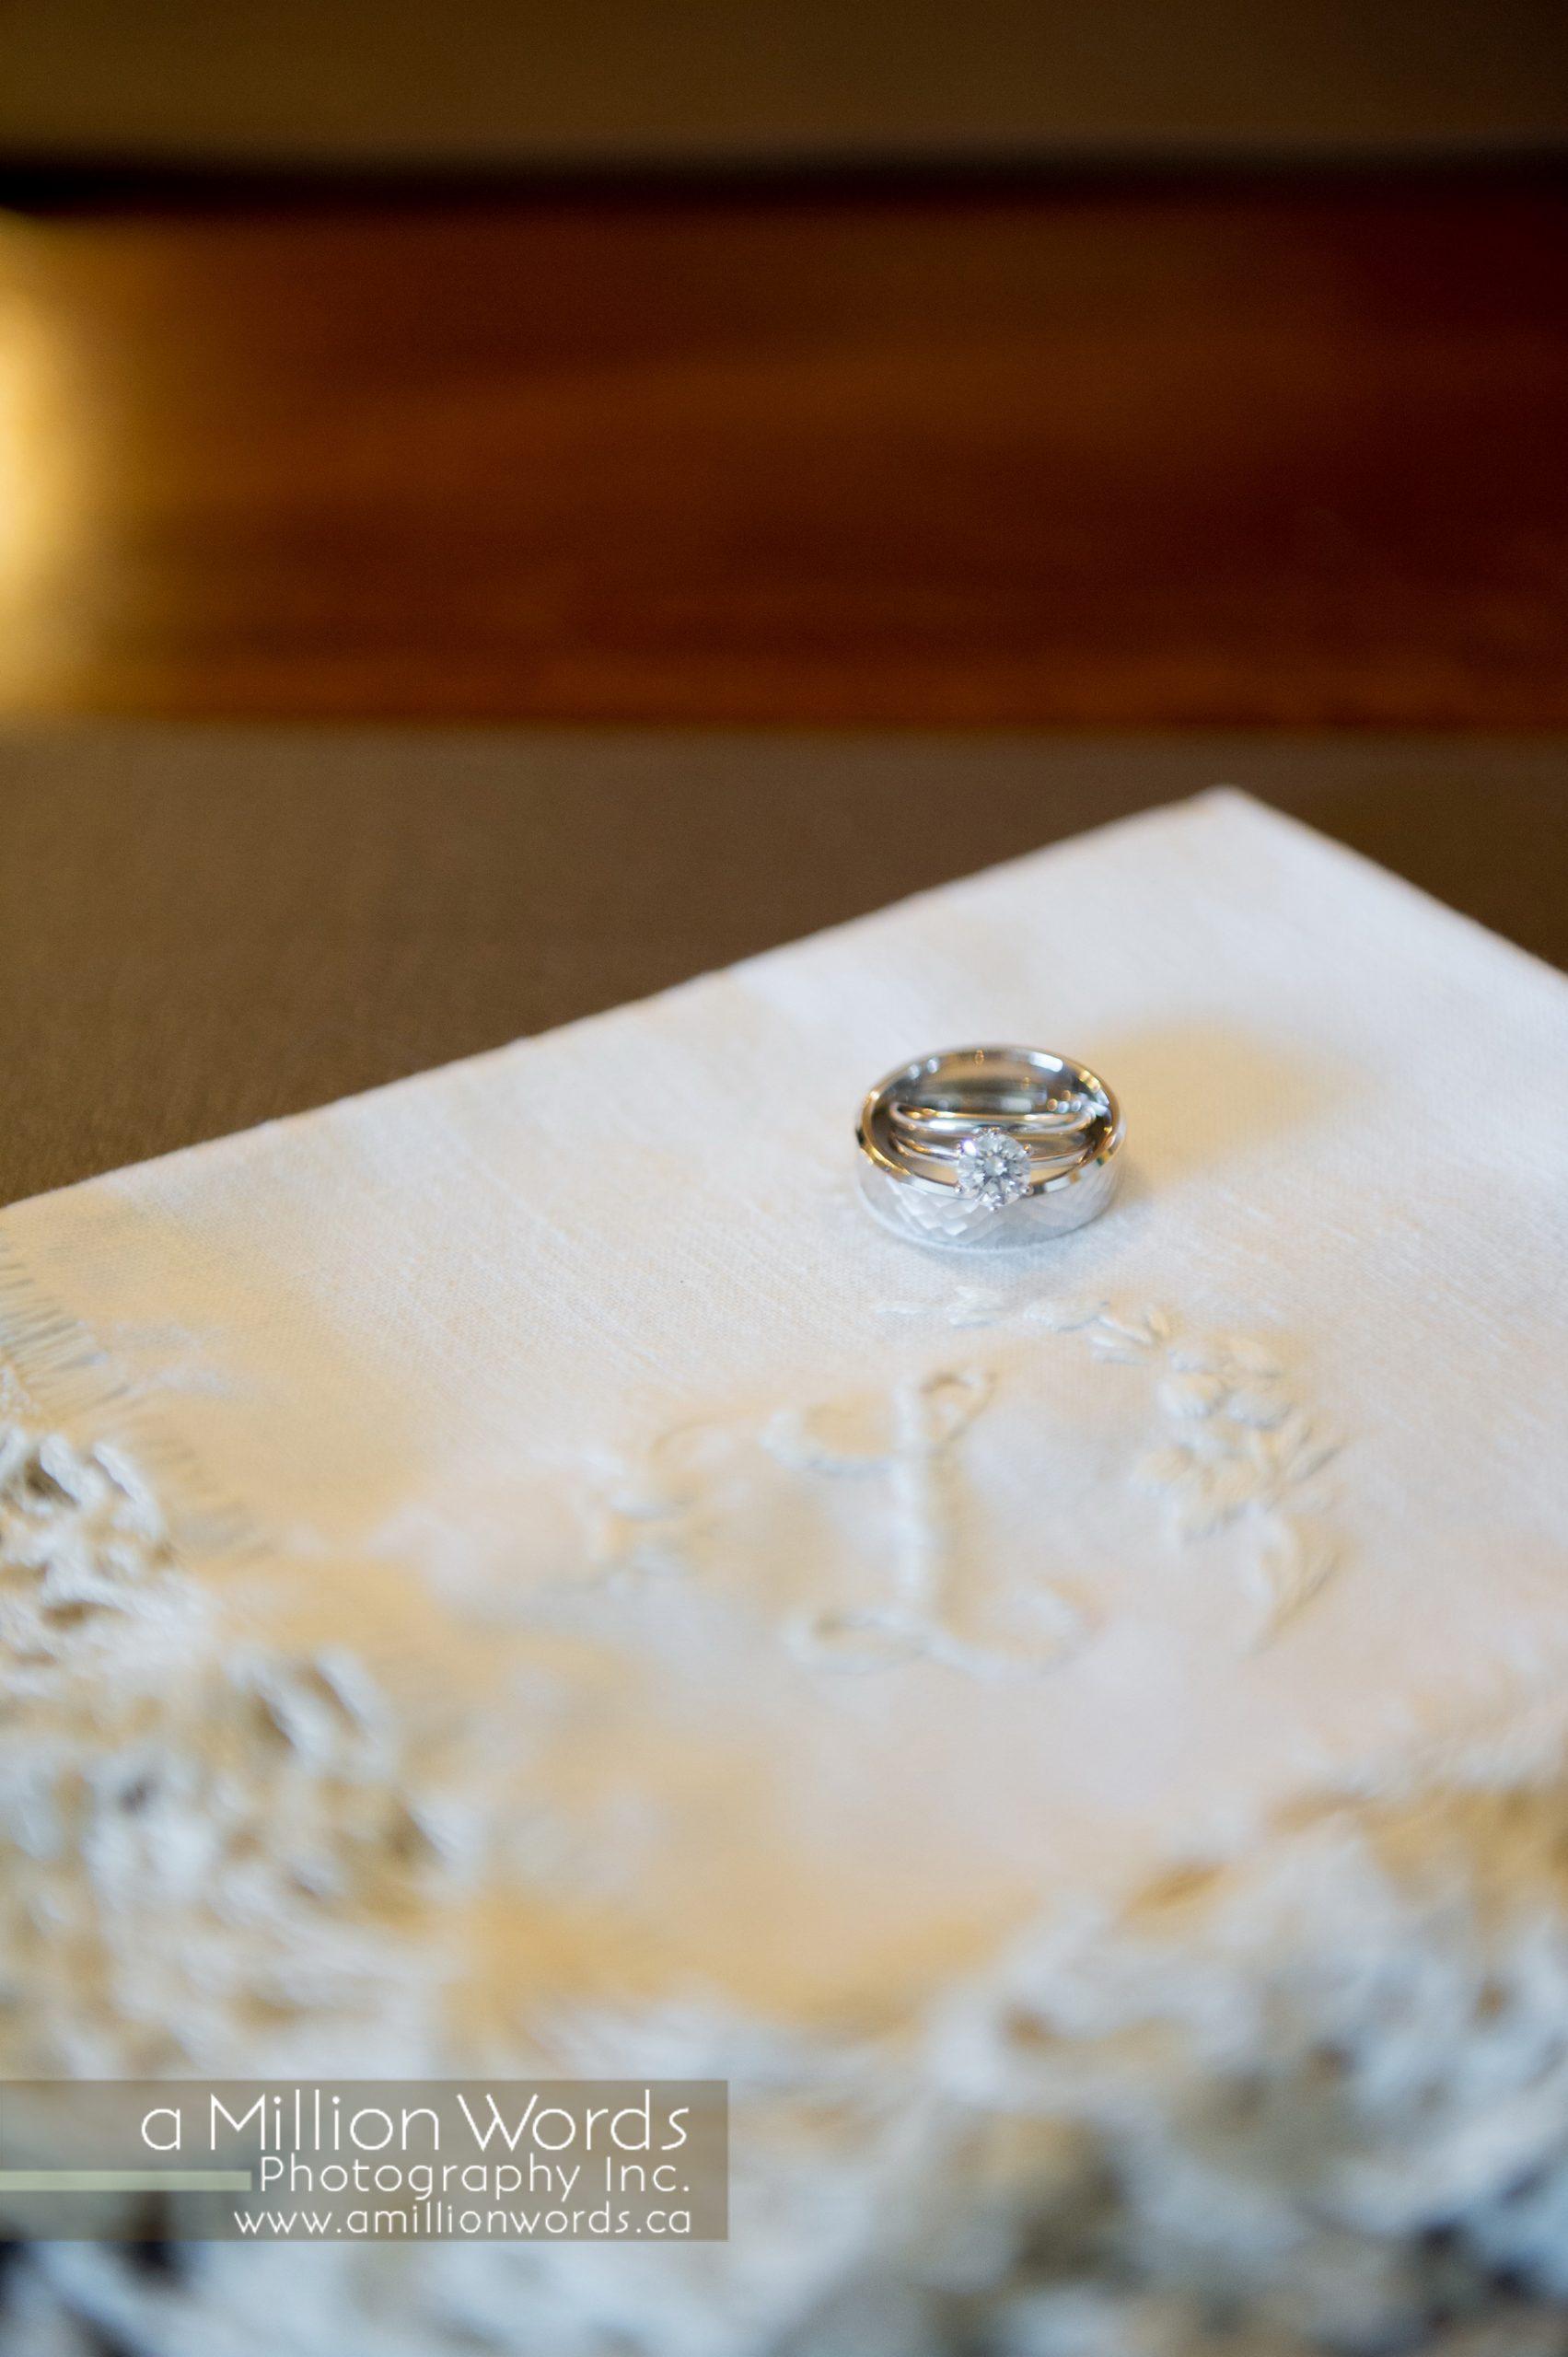 arthur_wedding_photographer08